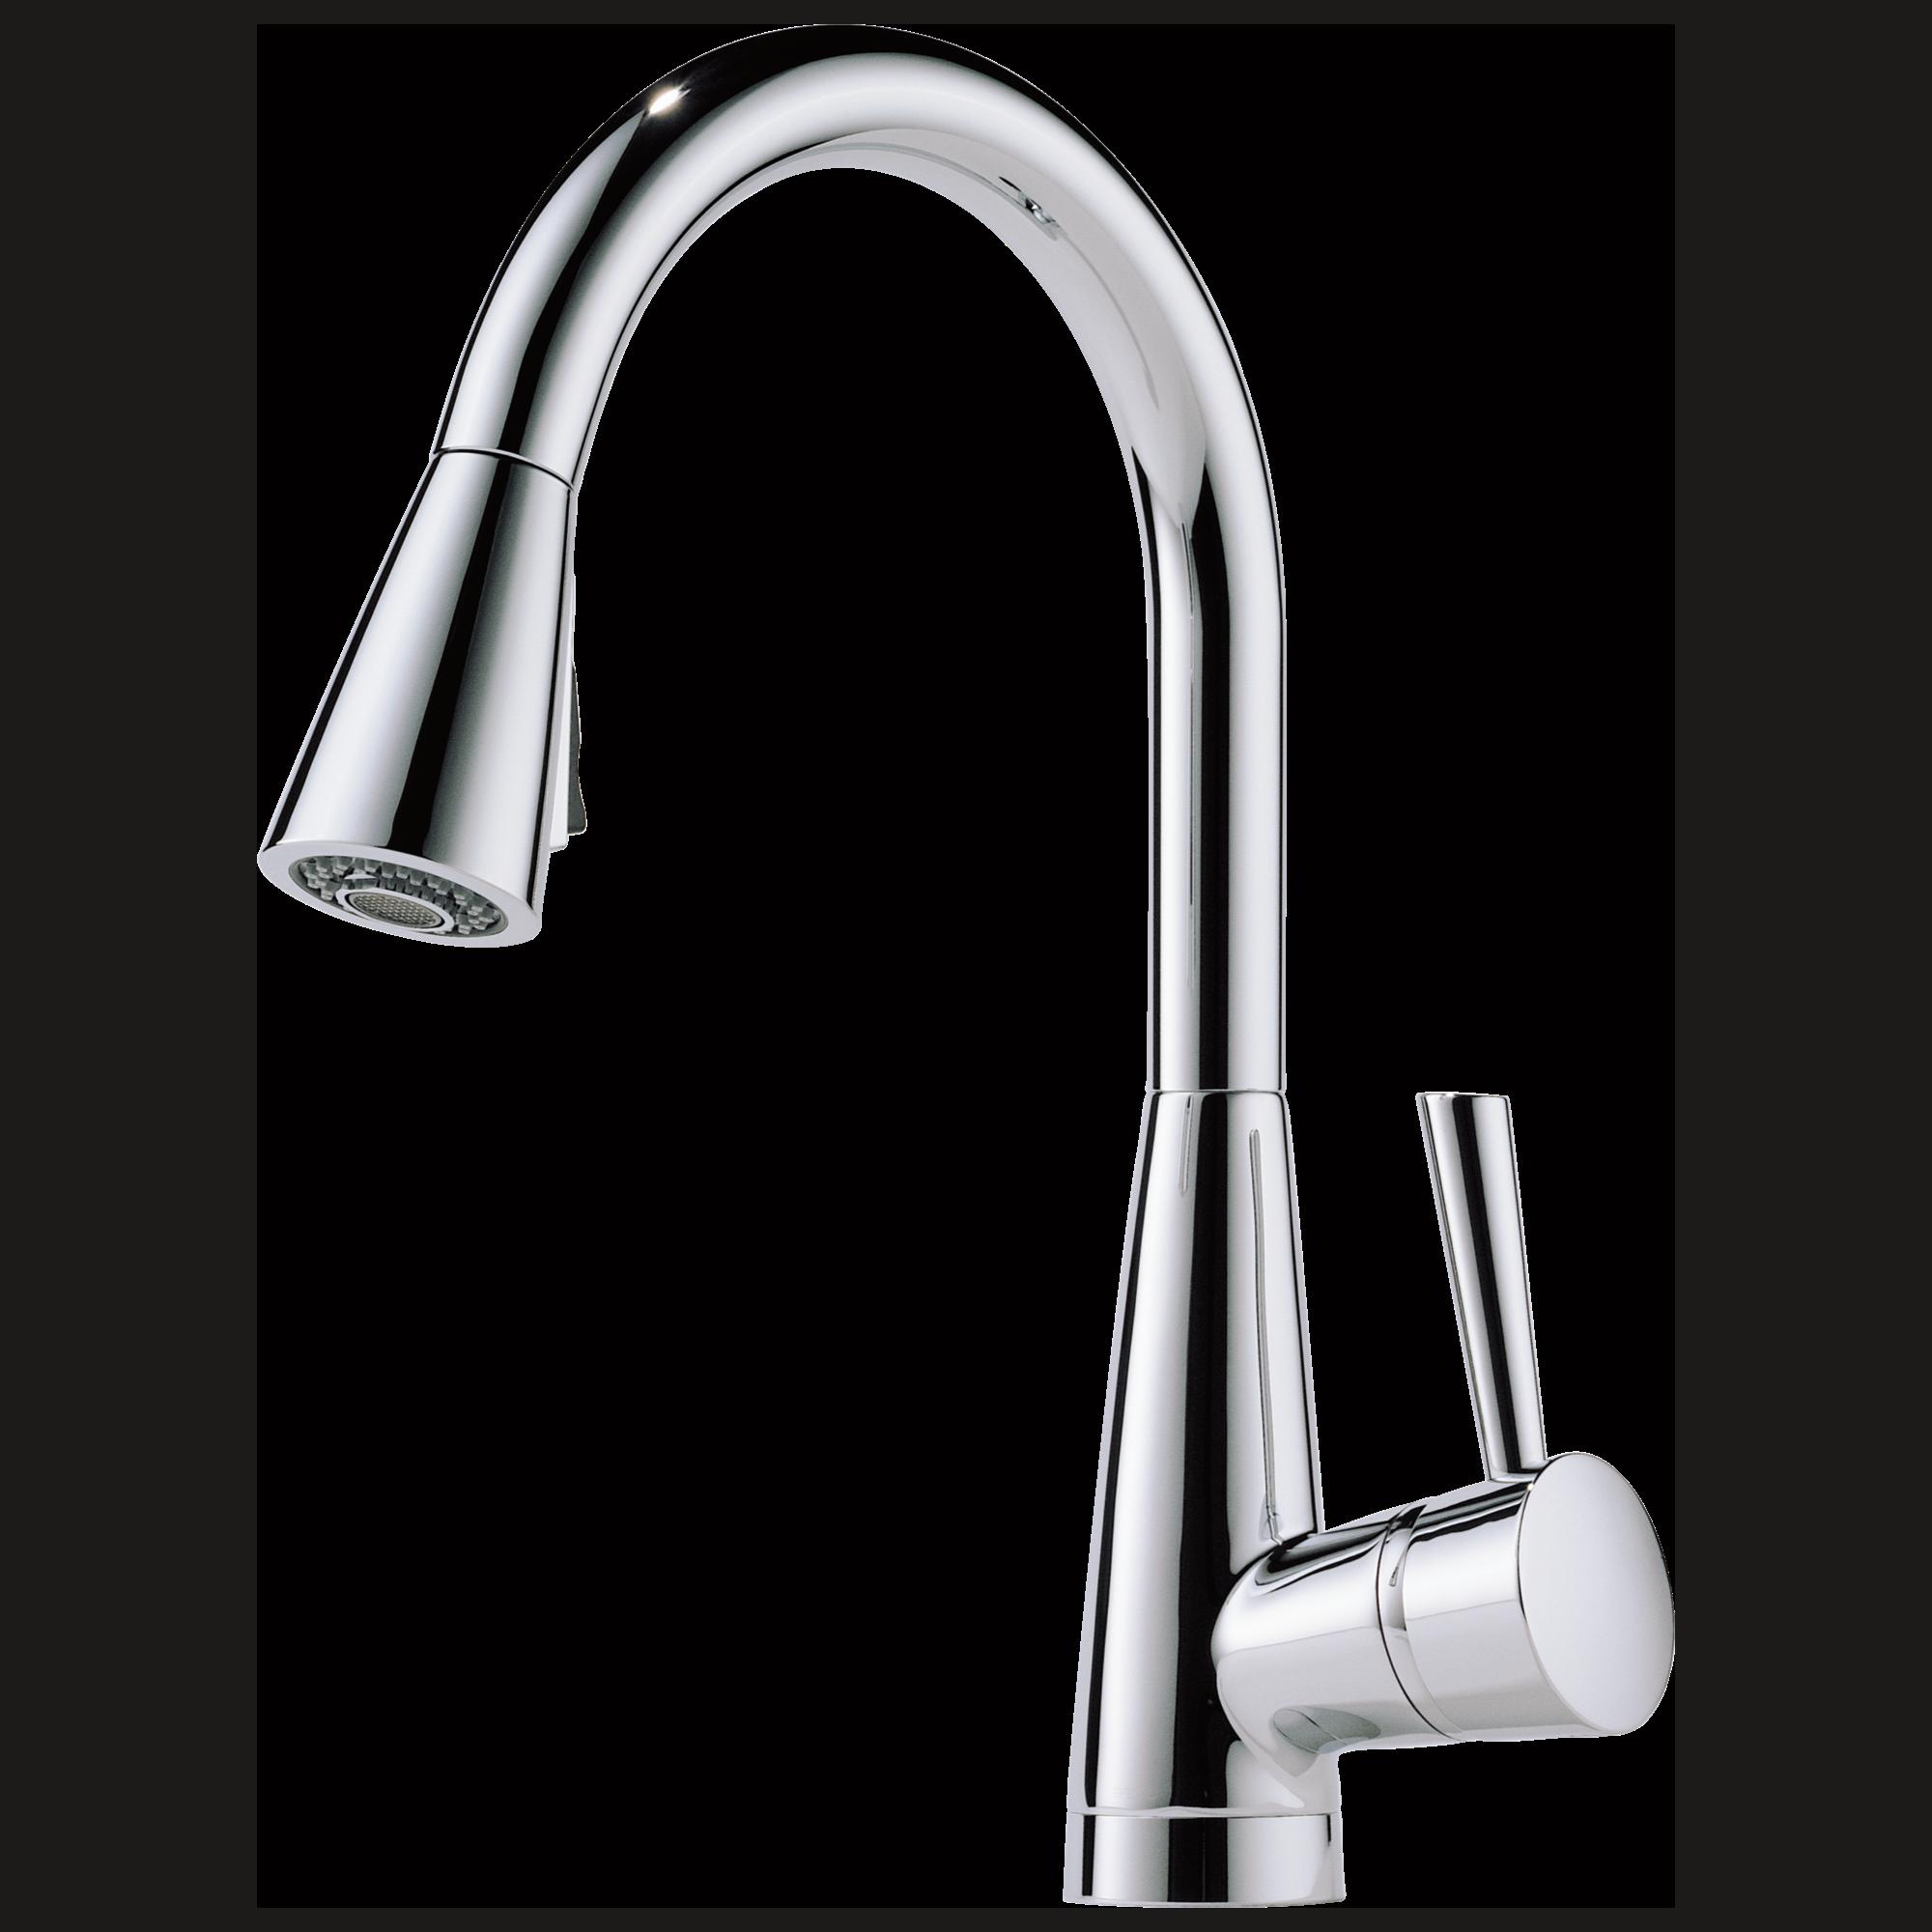 Sink Faucet Parts Diagram On Delta Sink Faucet Sprayer Replacement